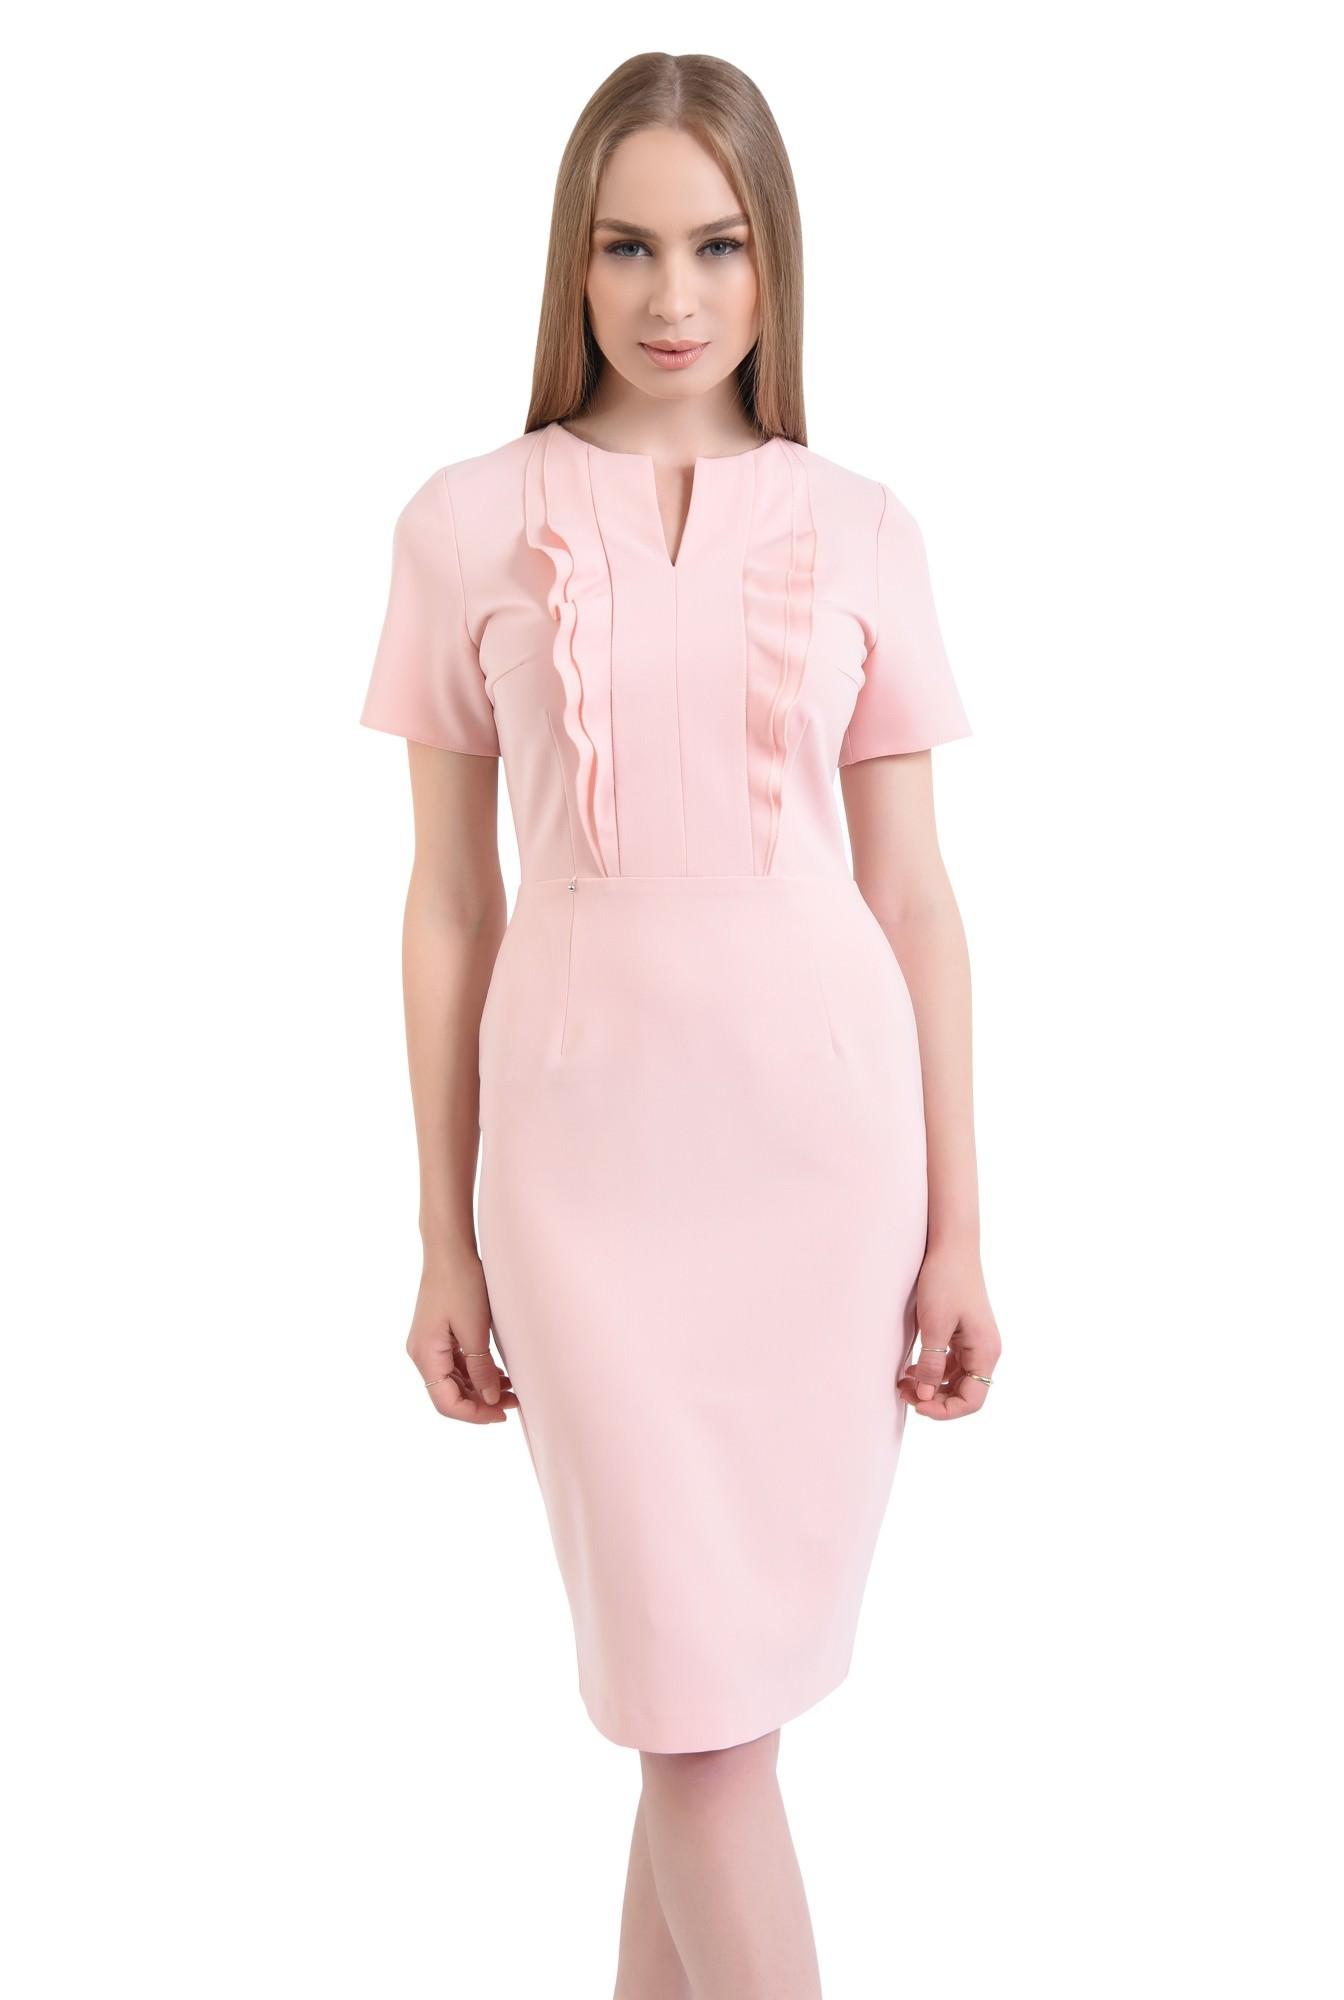 0 - Rochie conica, roz